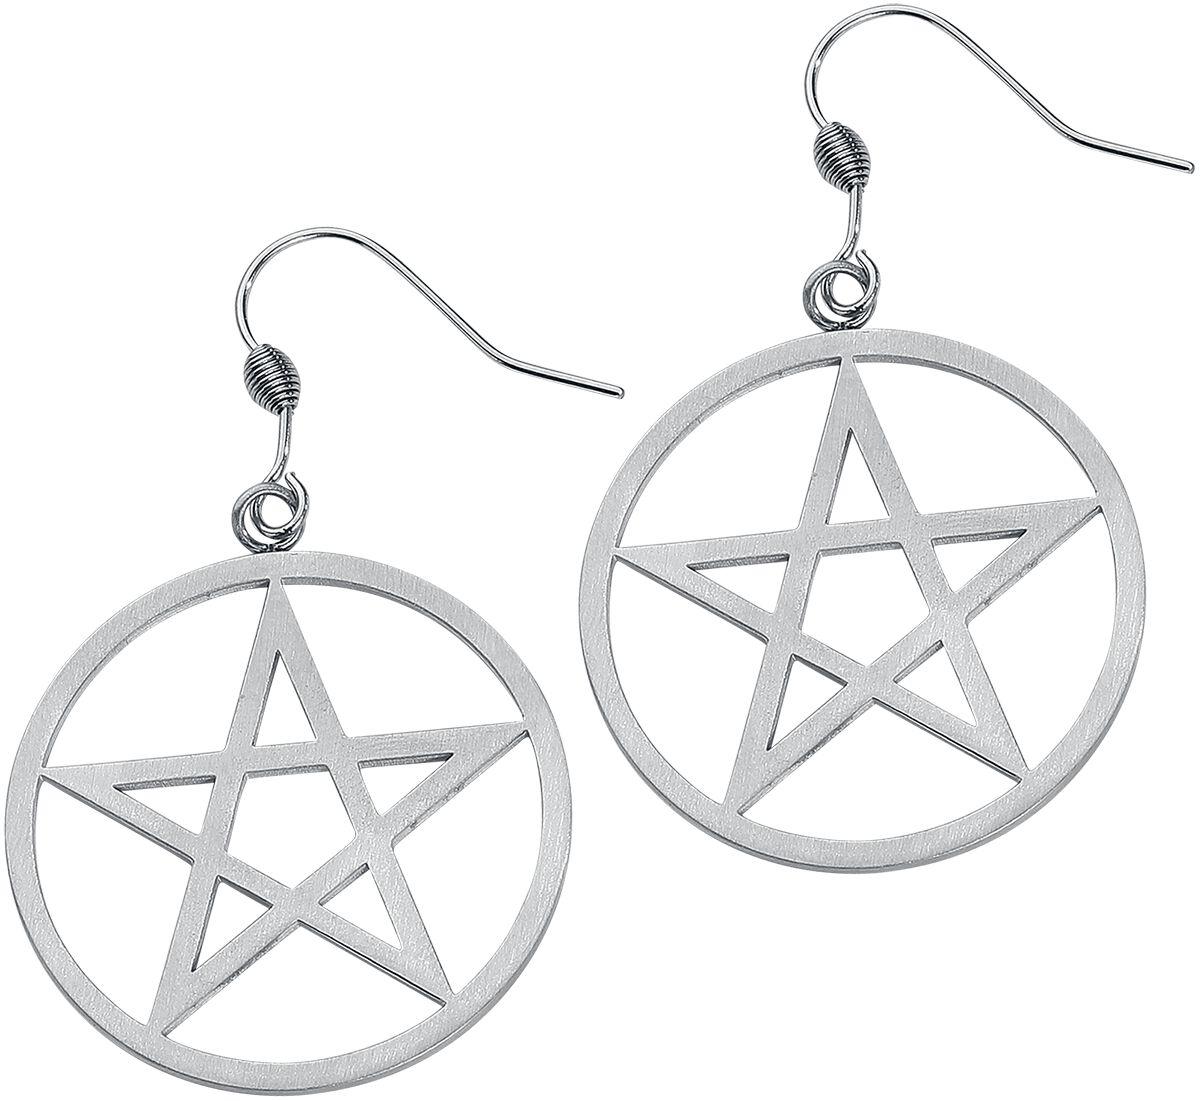 Basics - Kolczyki - Kolczyki etNox Hard and Heavy Pentagram Kolczyki srebrny - 368856